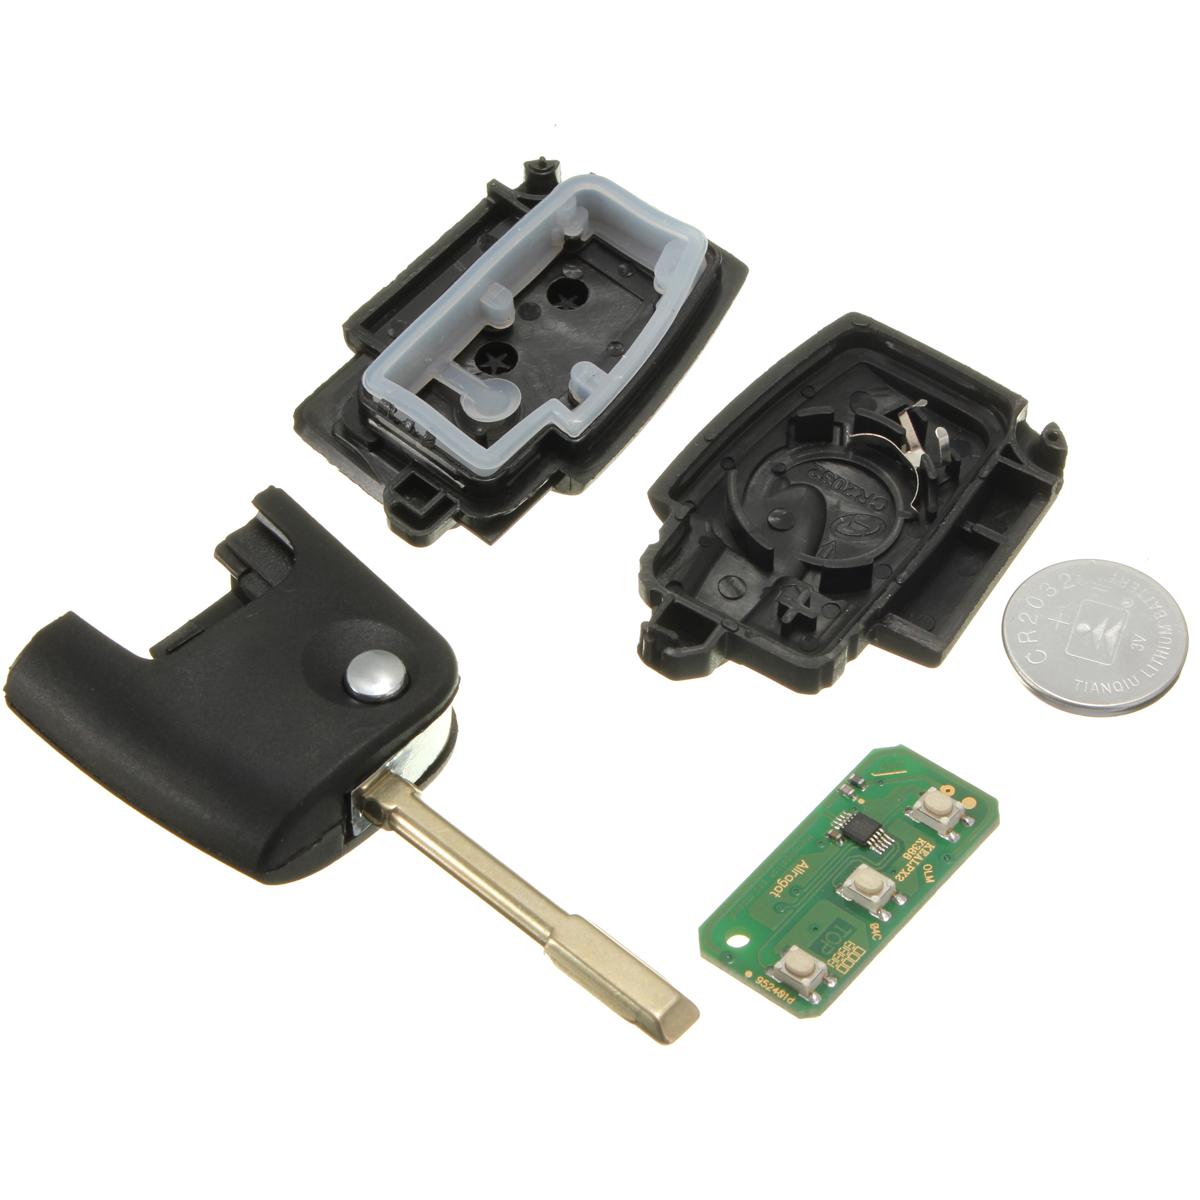 433mhz klappschl ssel schl ssel mit chip batterie f r ford focus mondeo transit ebay. Black Bedroom Furniture Sets. Home Design Ideas